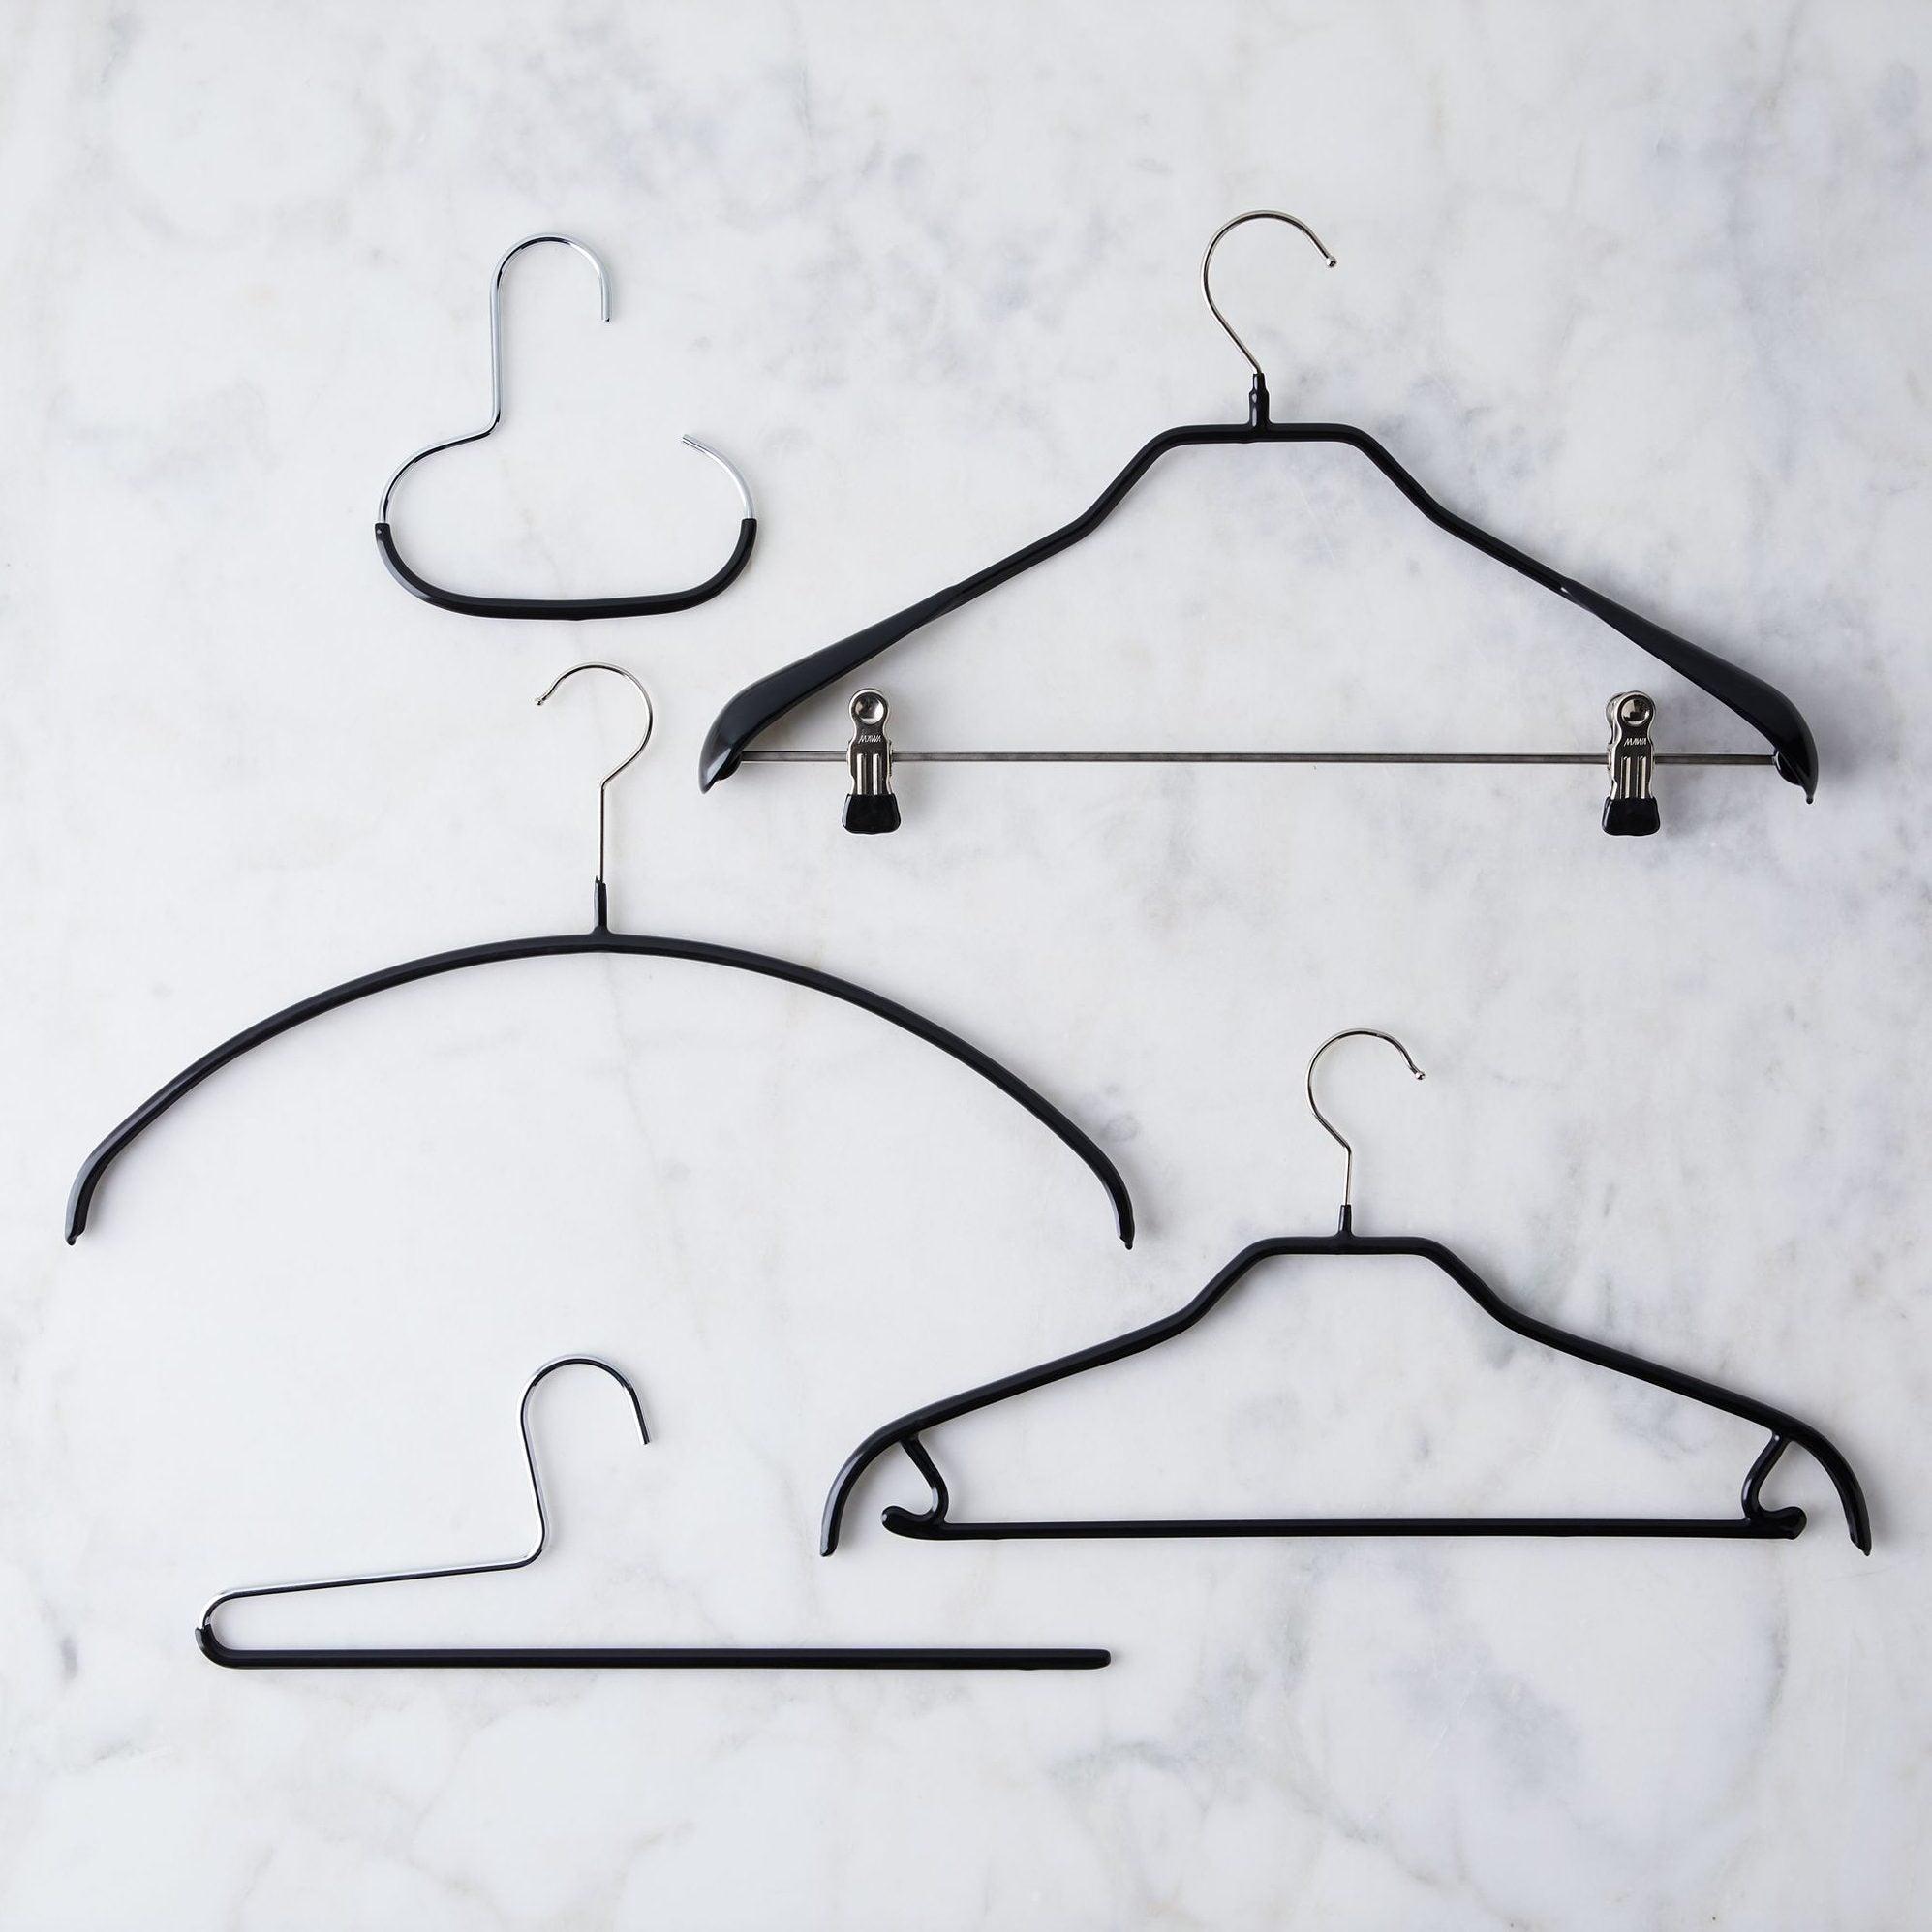 a22c66cf-1403-485b-938f-89530773d292–2019-1217_mawa_european-space-saving-hangers_ultimate-closet-kit-black_silo_ty-mecham